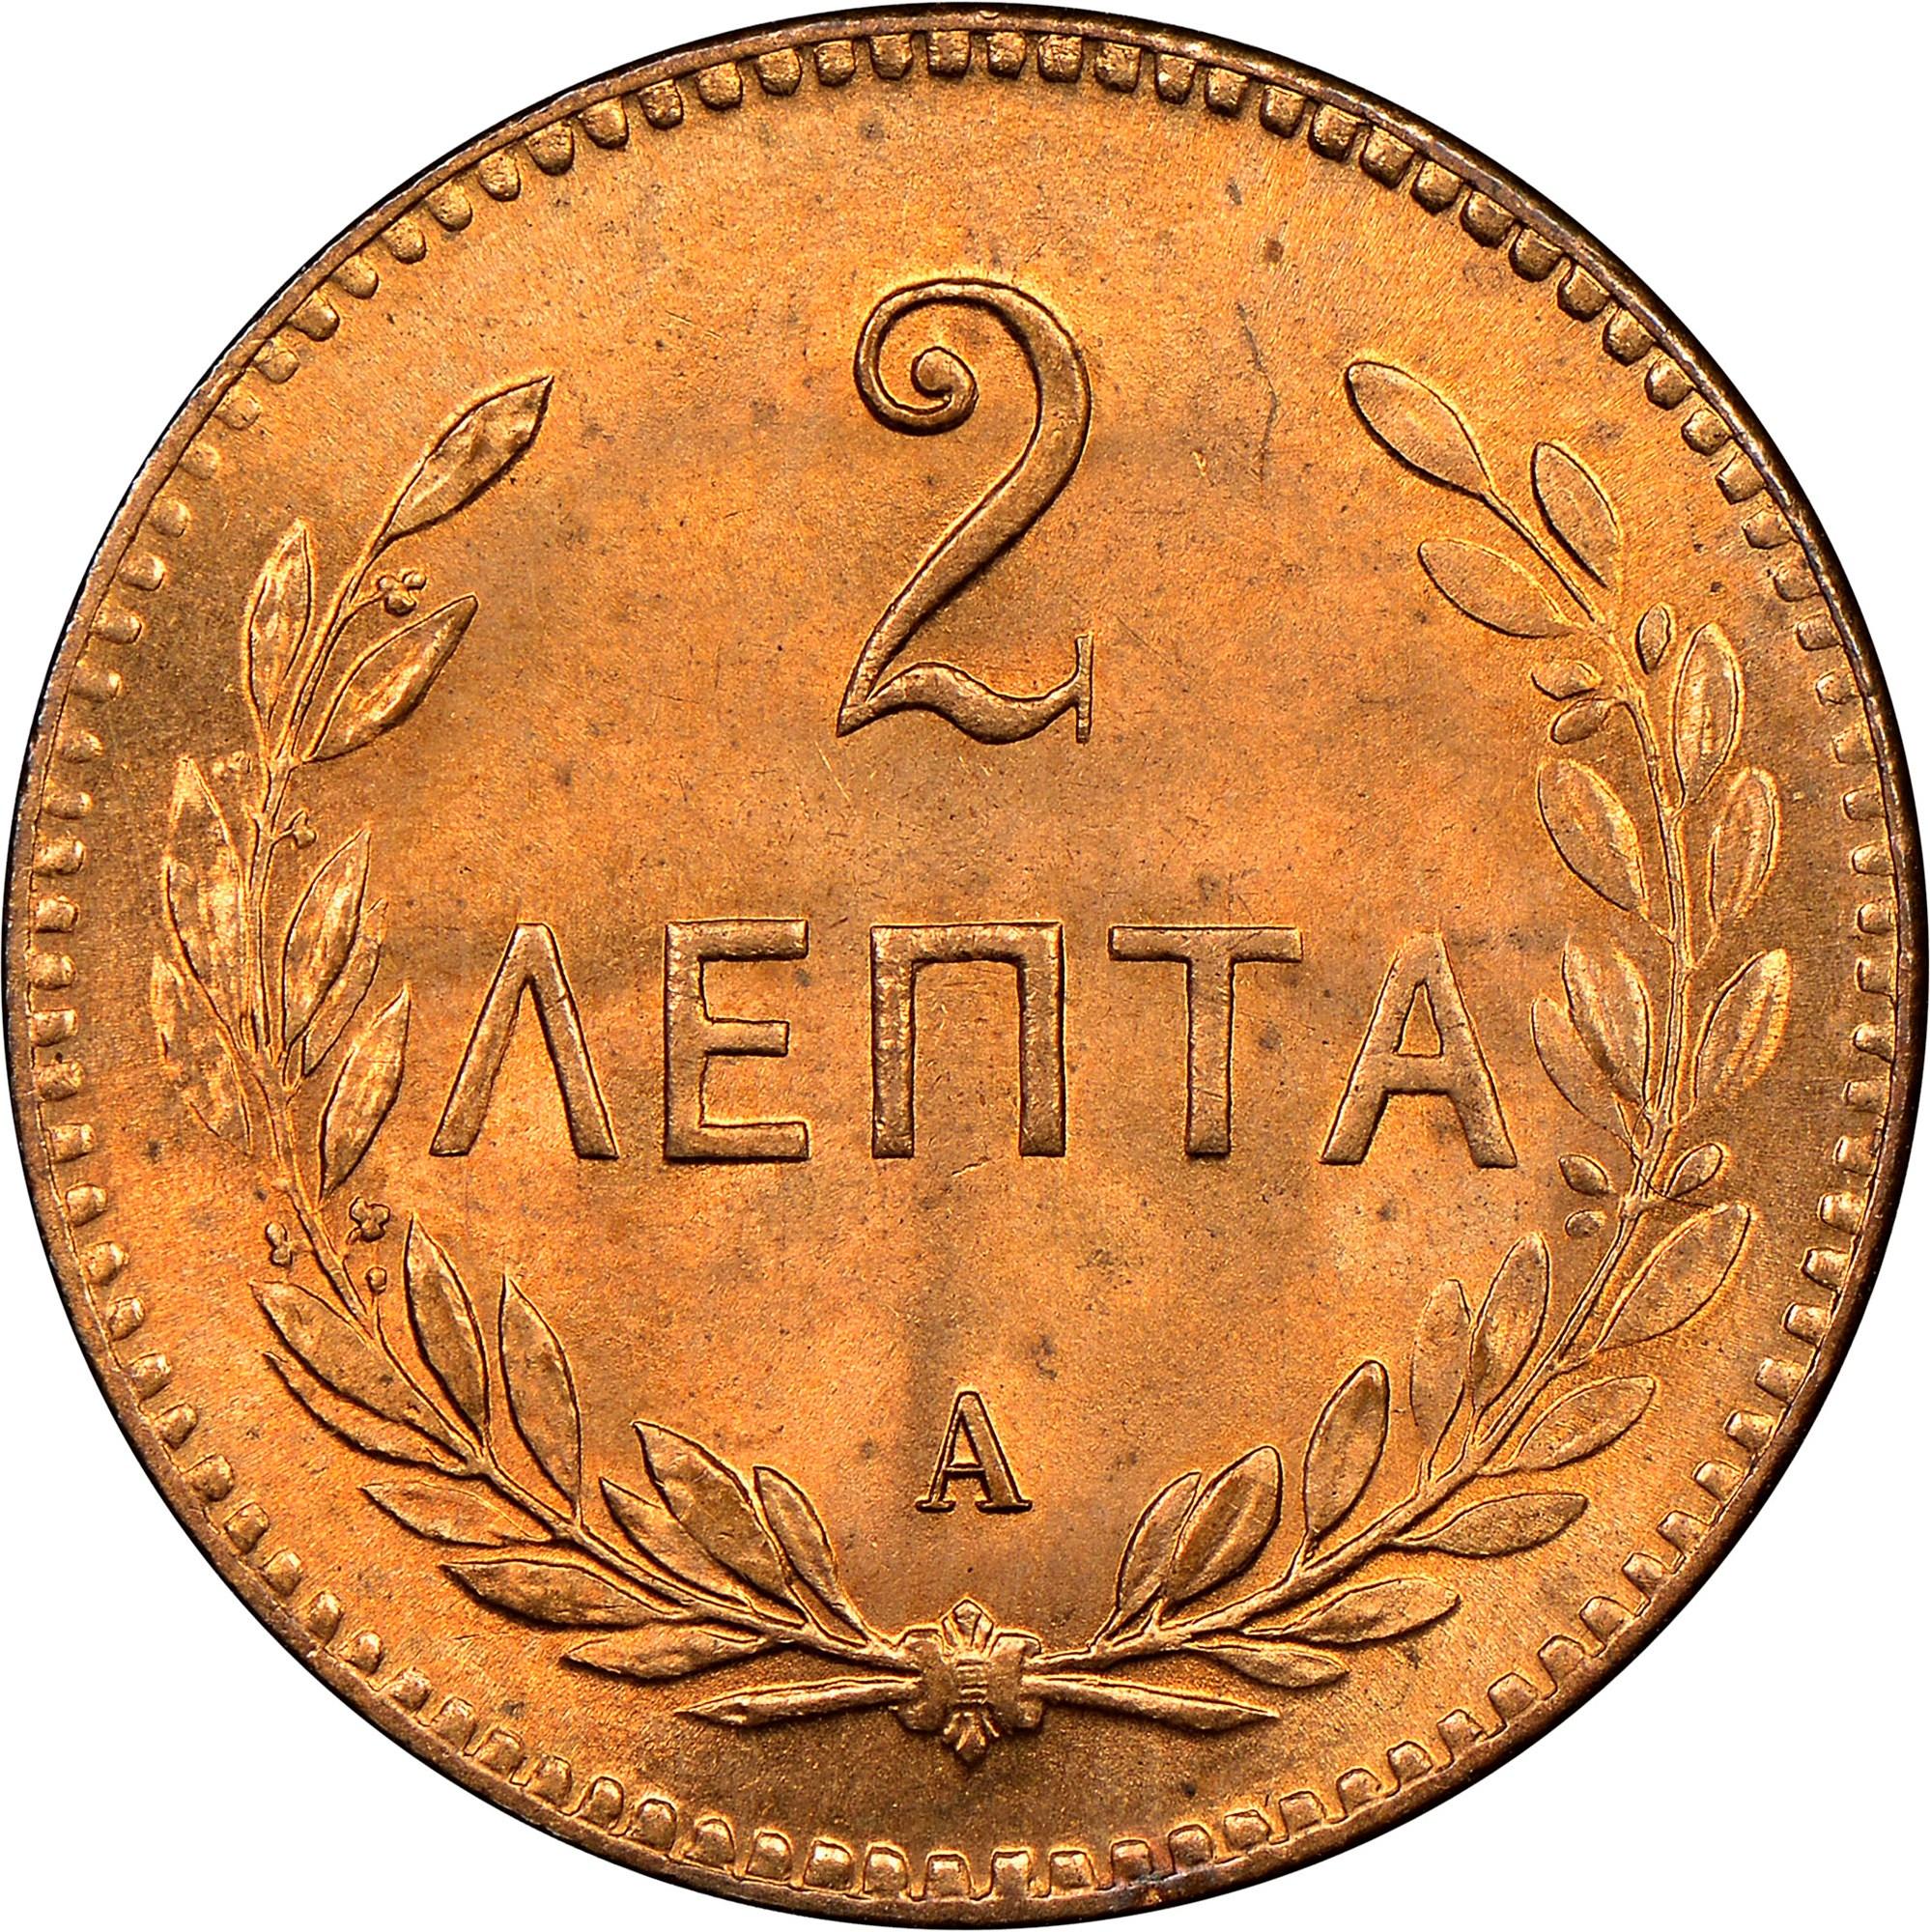 Crete 2 Lepta reverse